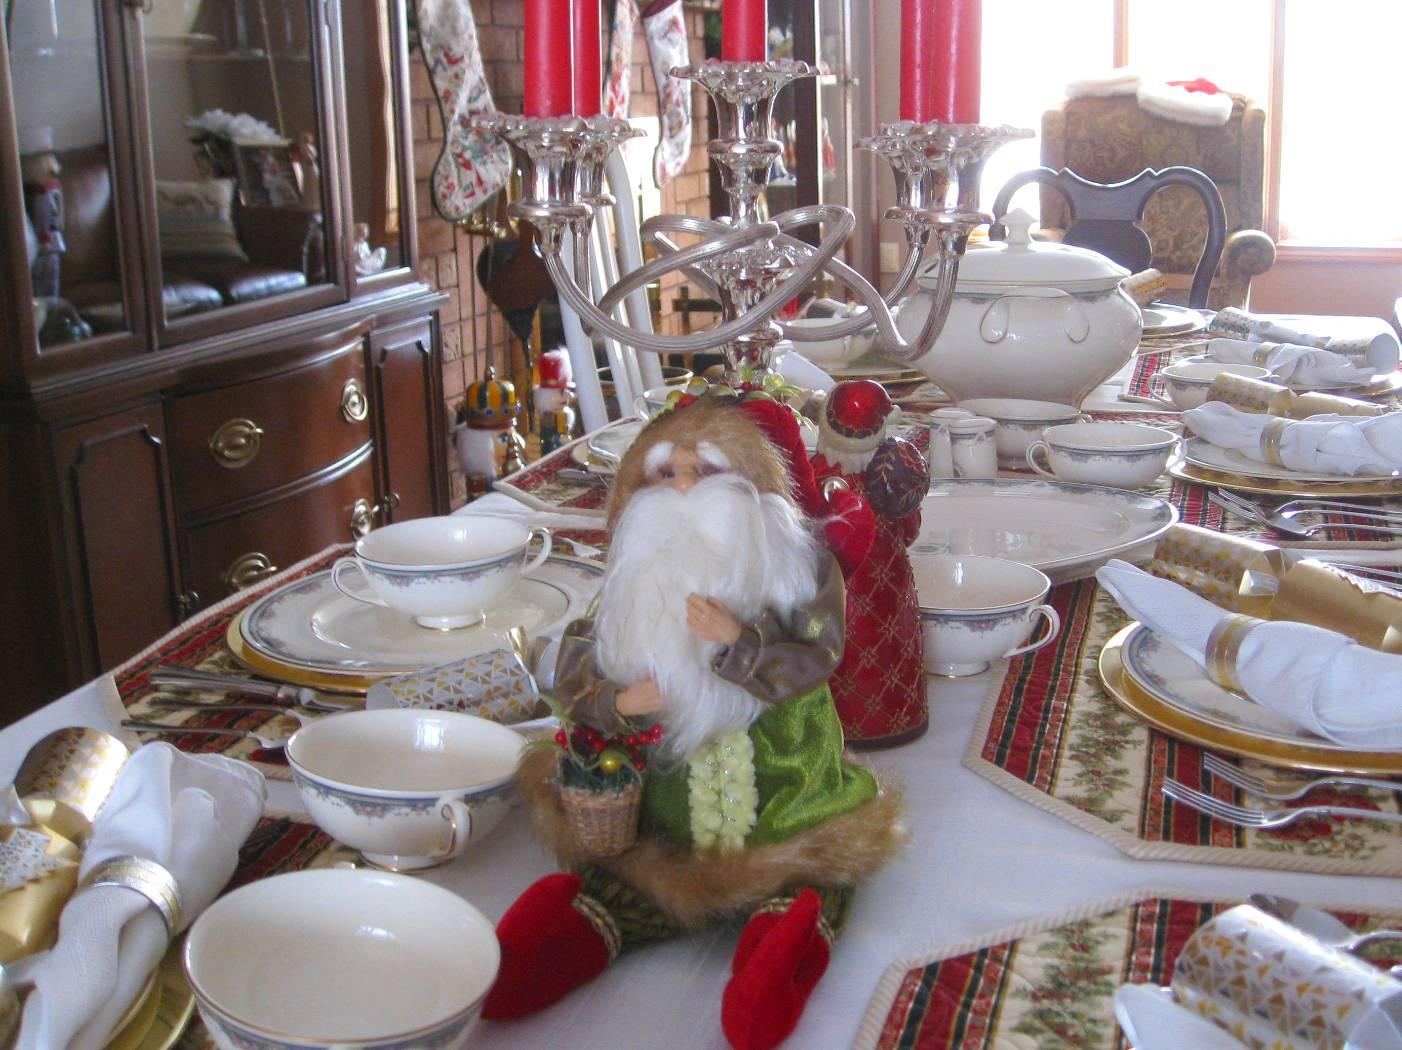 http://1.bp.blogspot.com/_AUrbDSzDvMs/TRZjmAacxWI/AAAAAAAACGI/vtqHb87S5Ug/s1600/Christmas_Table.JPG